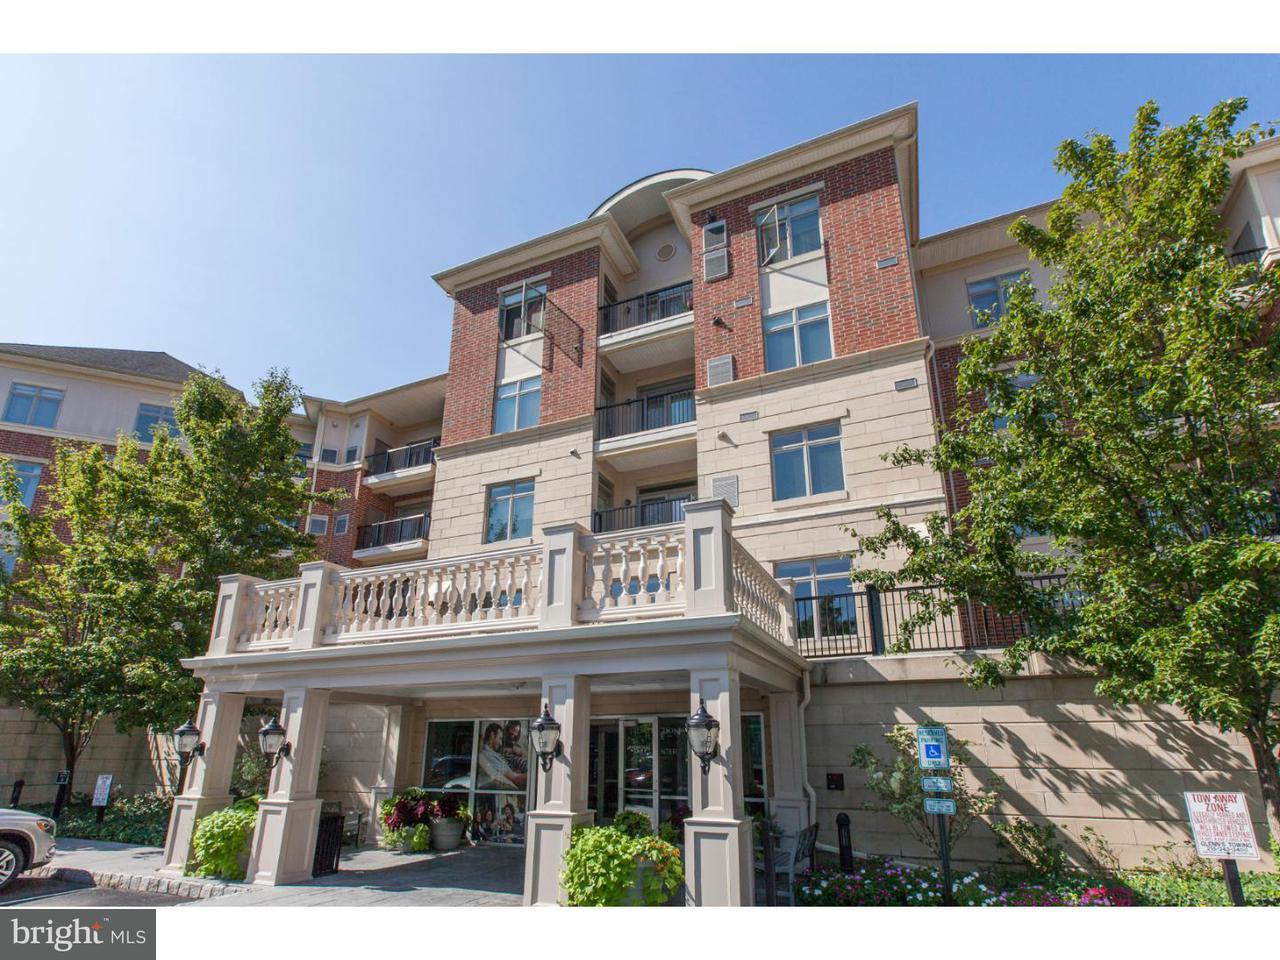 Condominium for Rent at 510 CARSON TER Huntingdon Valley, Pennsylvania 19006 United States